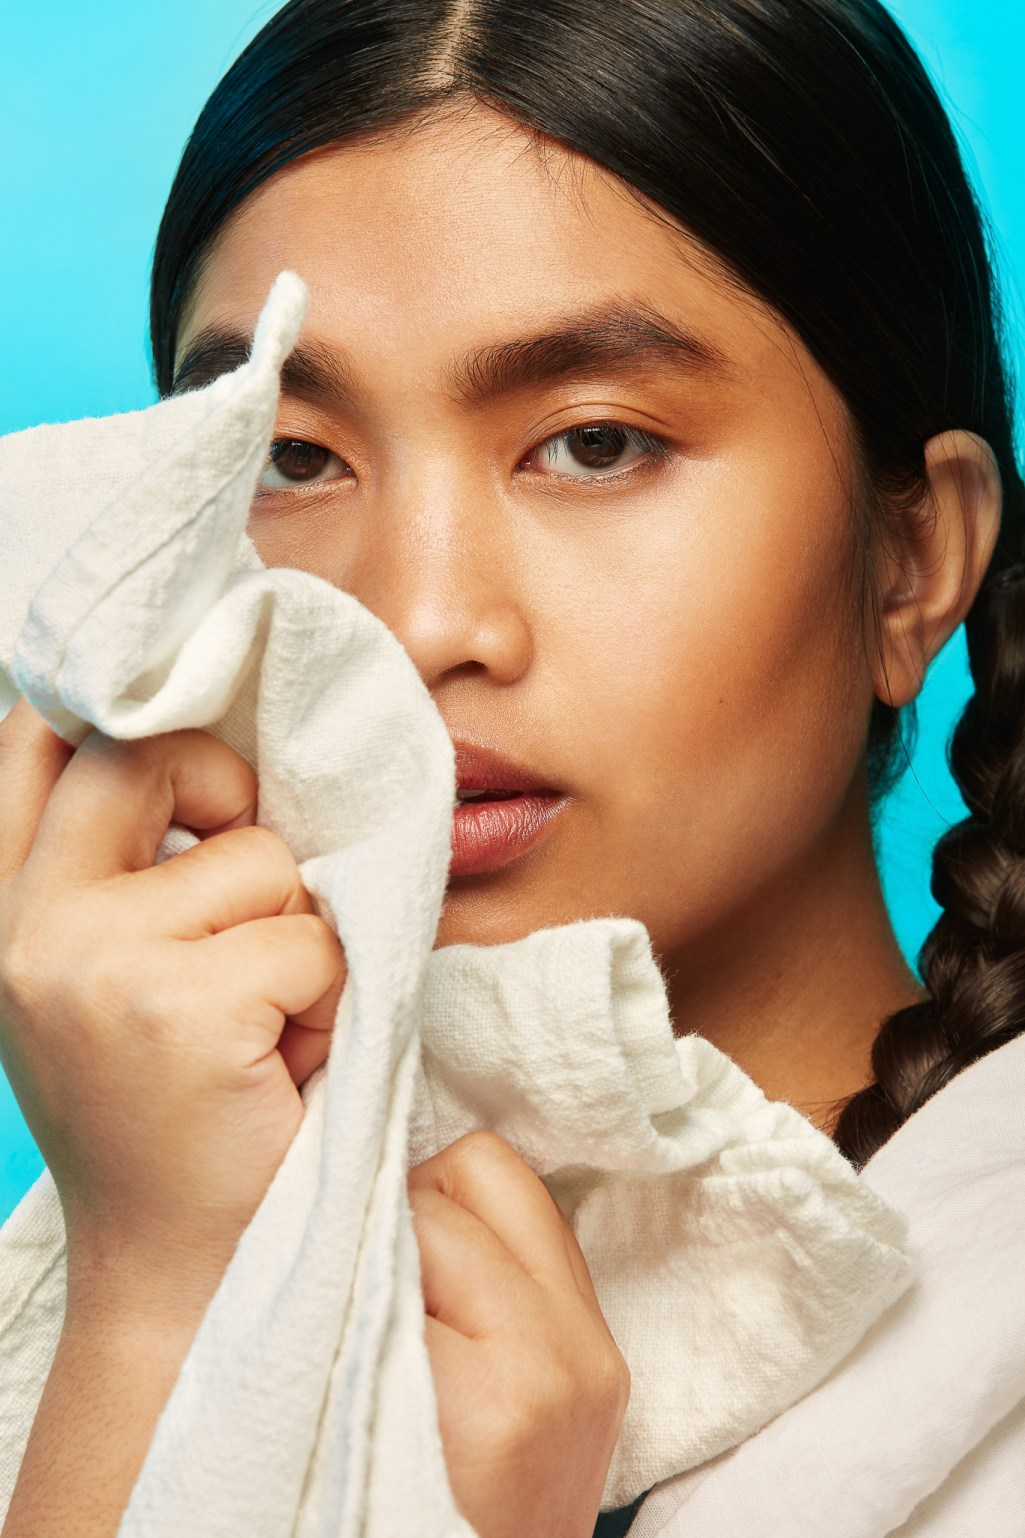 Beauty Portrait of AAPI model showing clean skin by San Francisco bay area photographer Ella Sophie